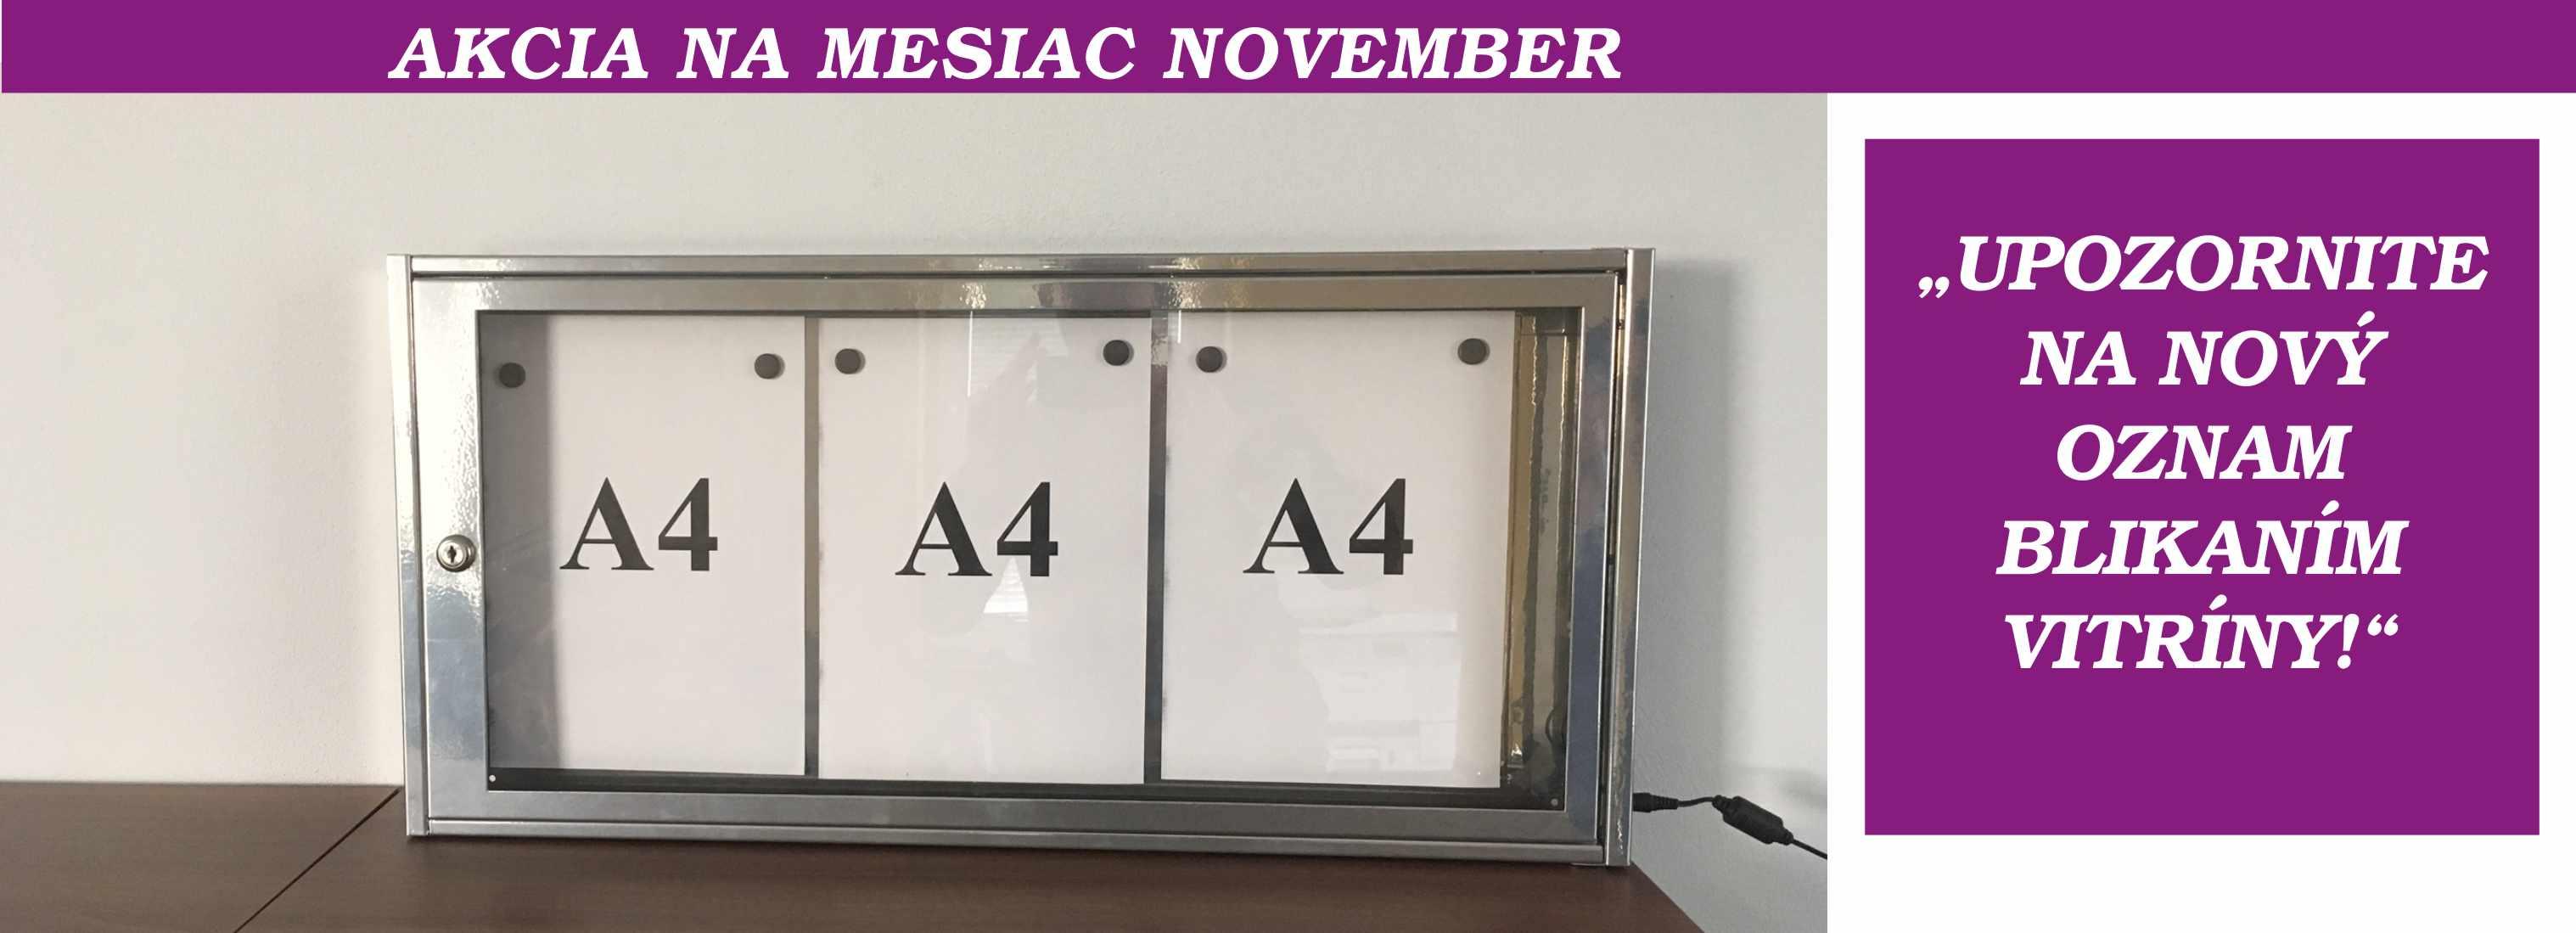 akcia-november-blikanie-vitriny-5